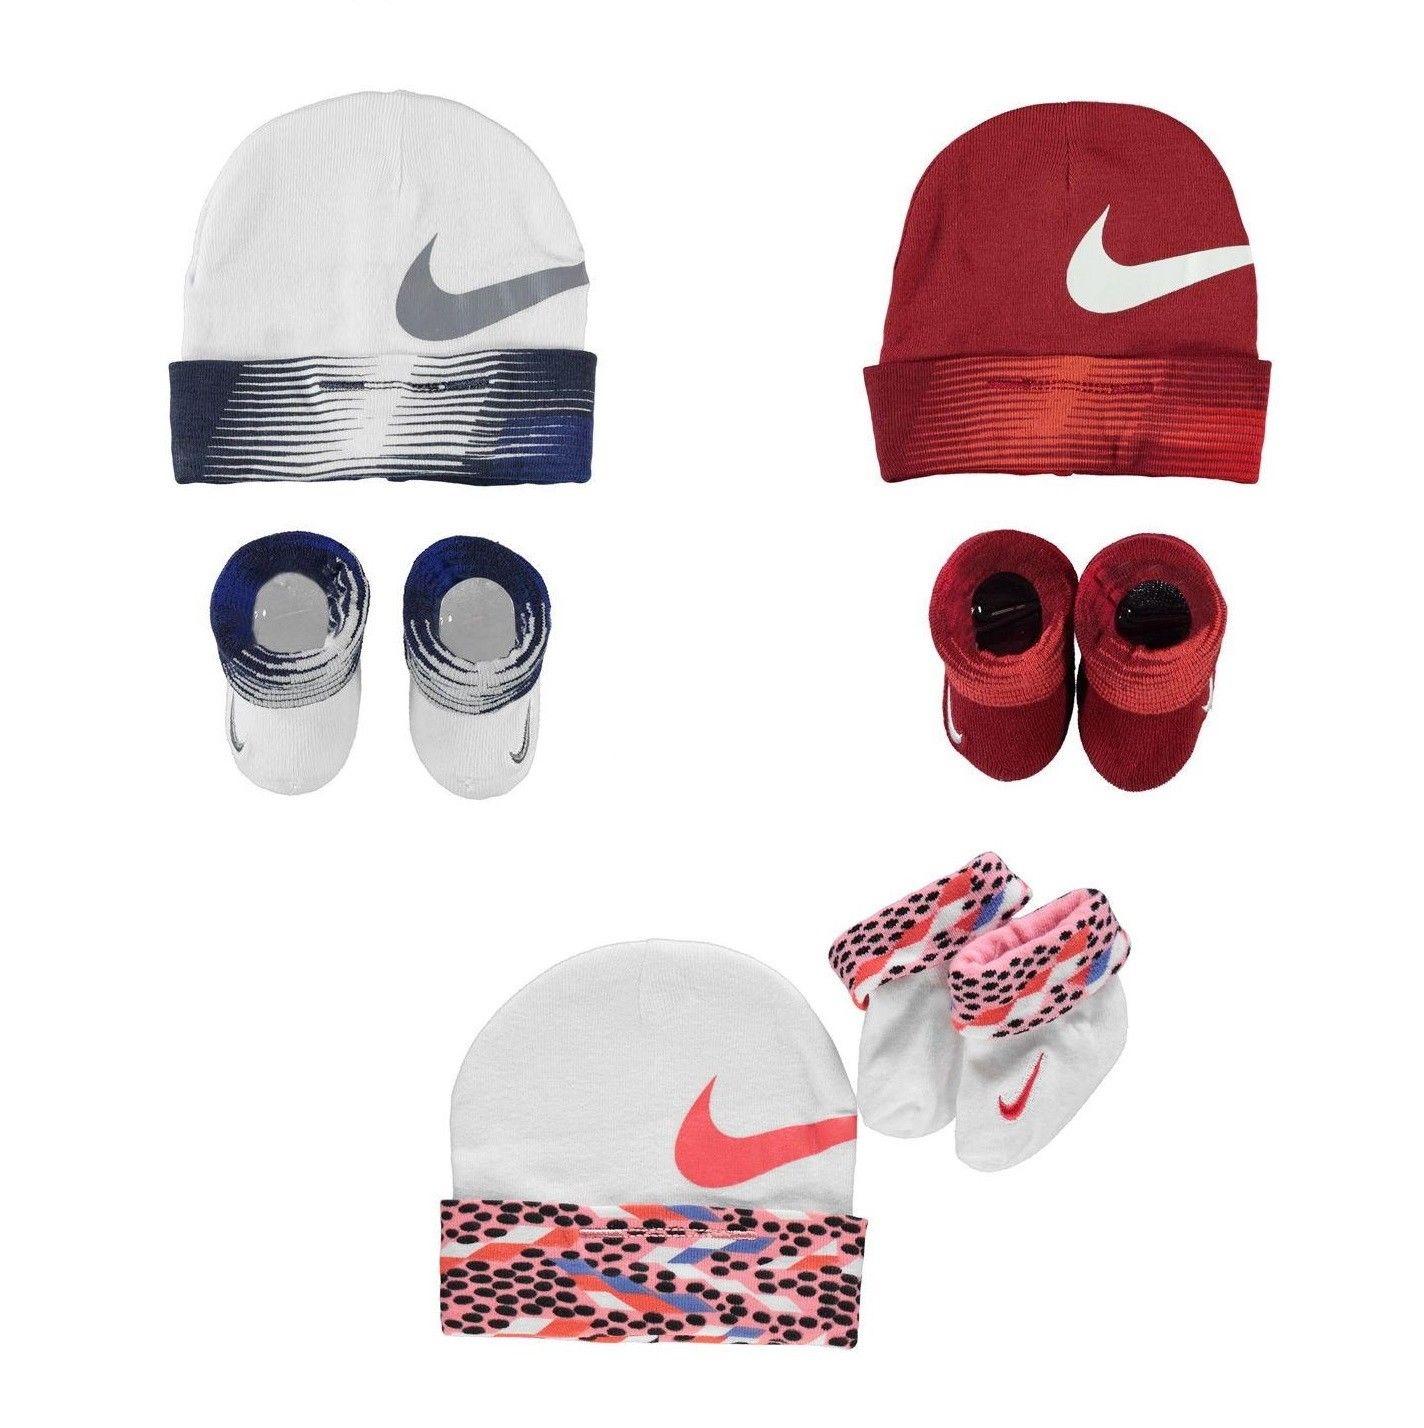 Nike Baby Socken Mütze Set 2 Teile Schuhe Neugeborene 0-6 Monate